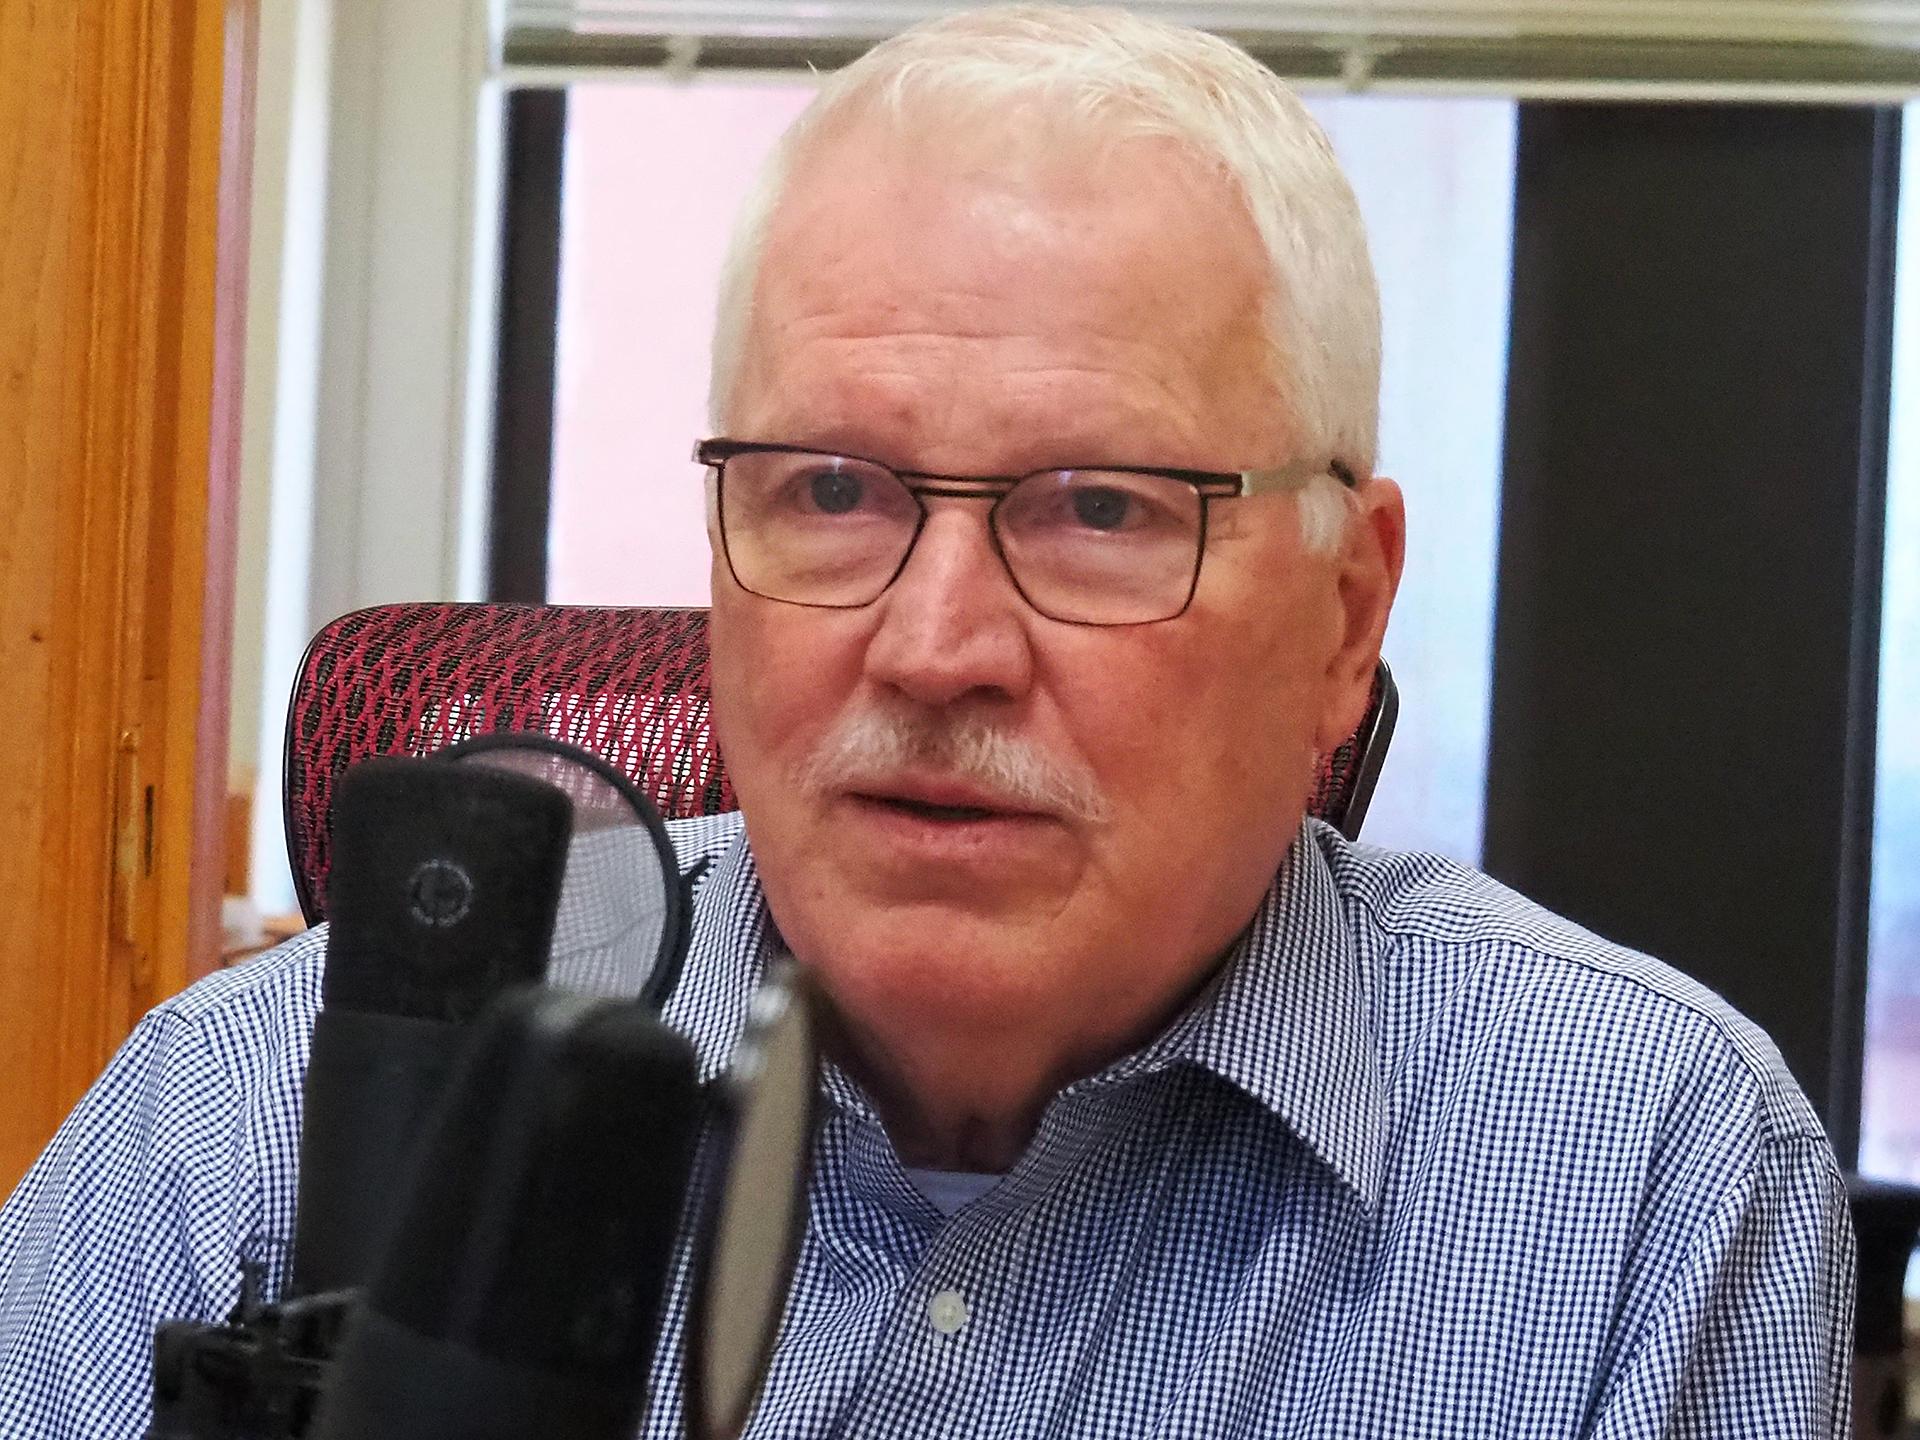 Kansas officials urge vaccination as concerns intensify over Delta variant